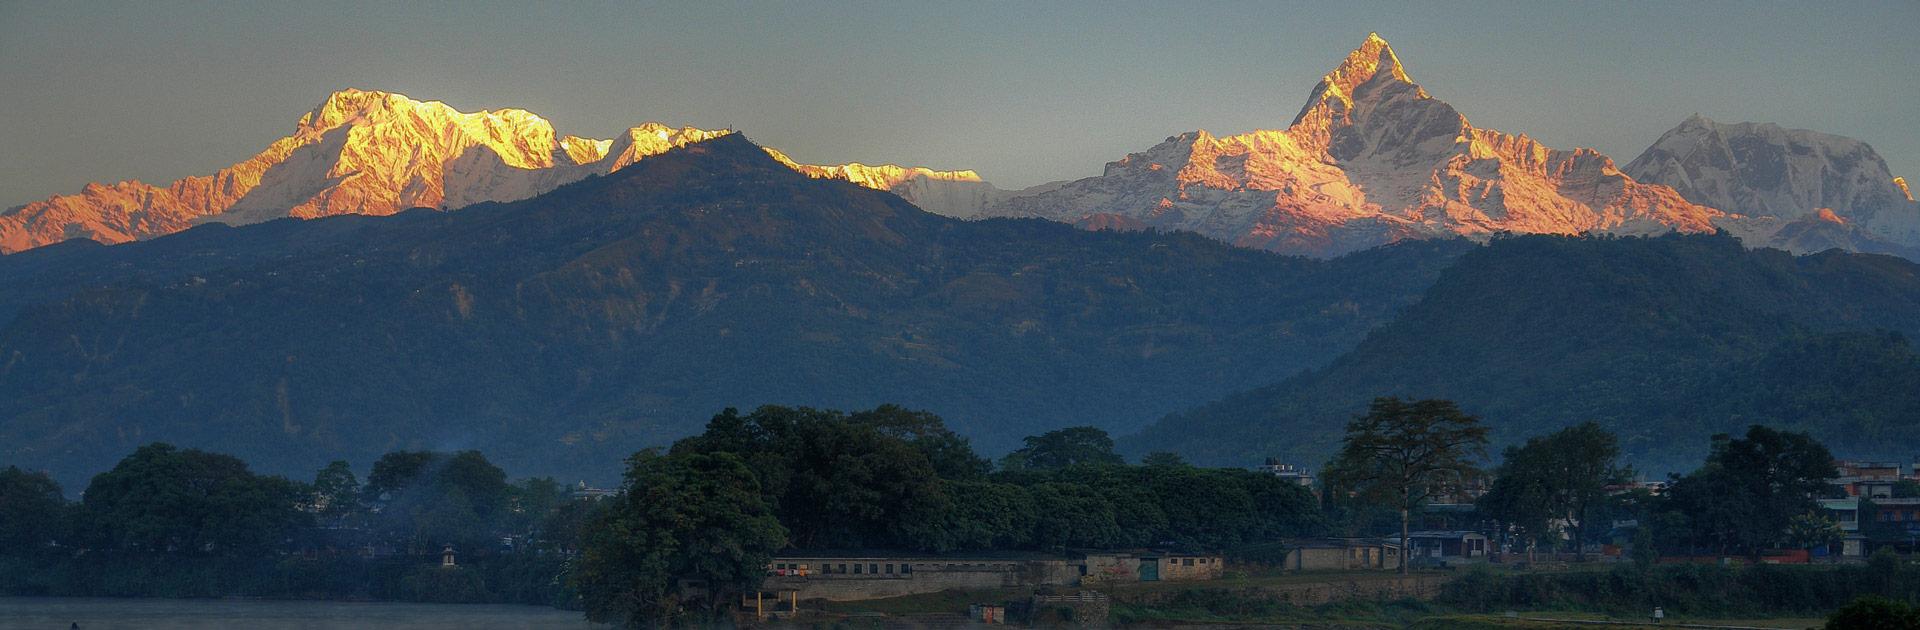 NP Nepal Clásico 9 días 2